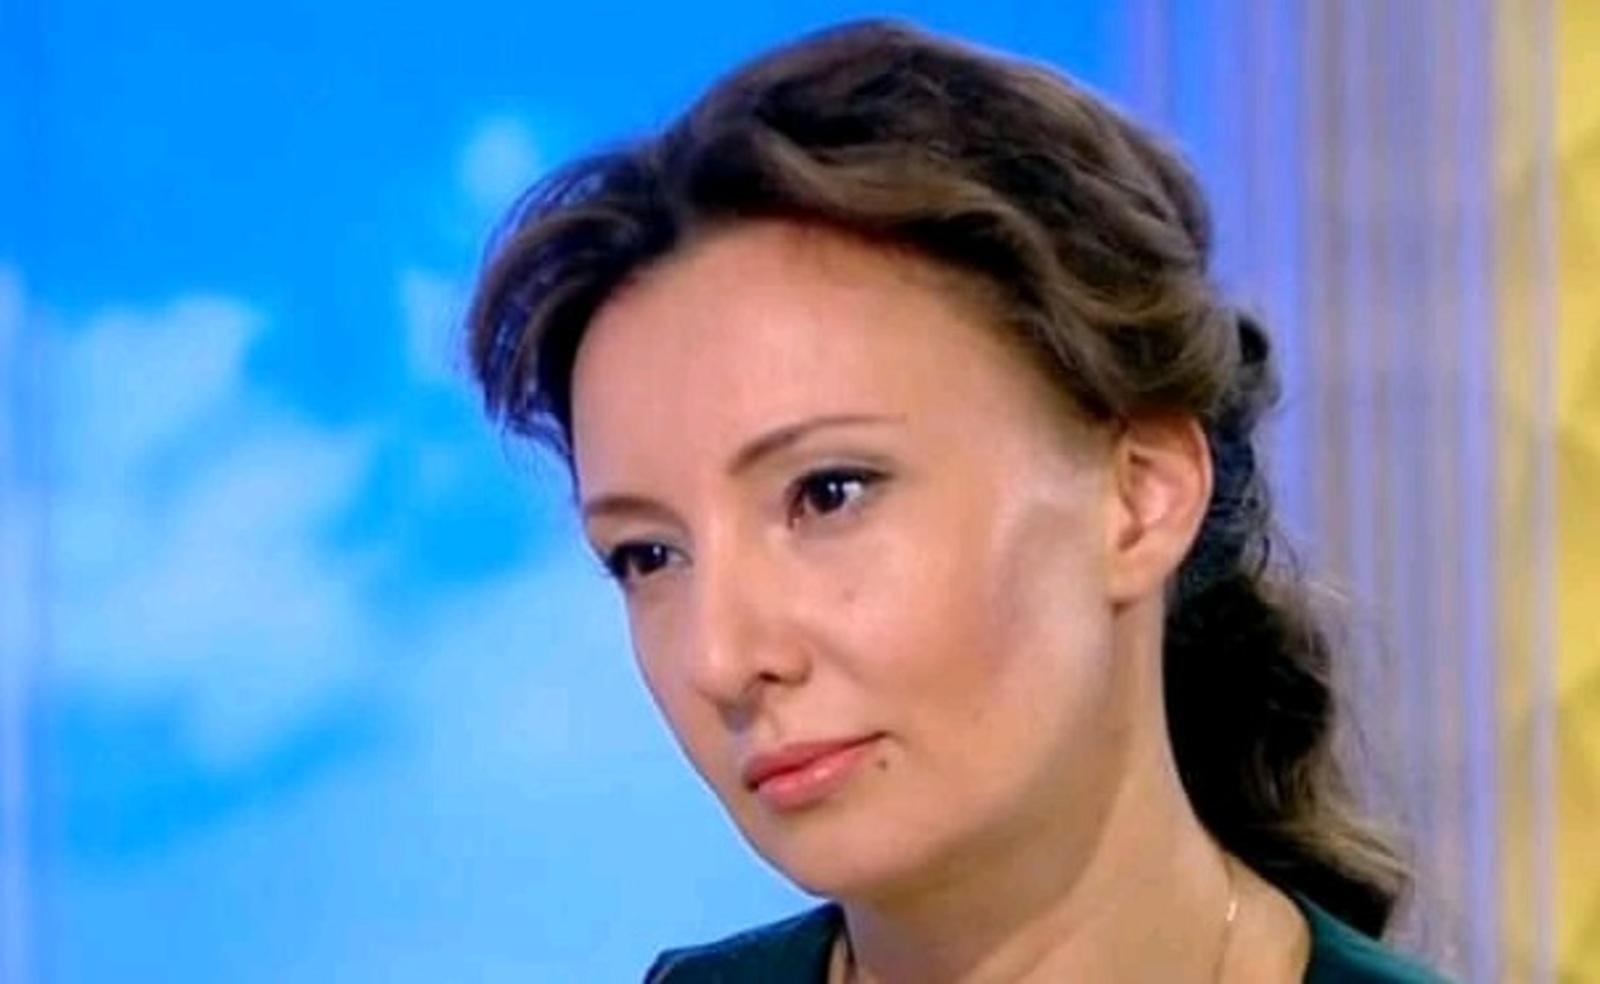 Анна Кузнецова осудила бездействие органов опеки в ситуации с истязанием детей